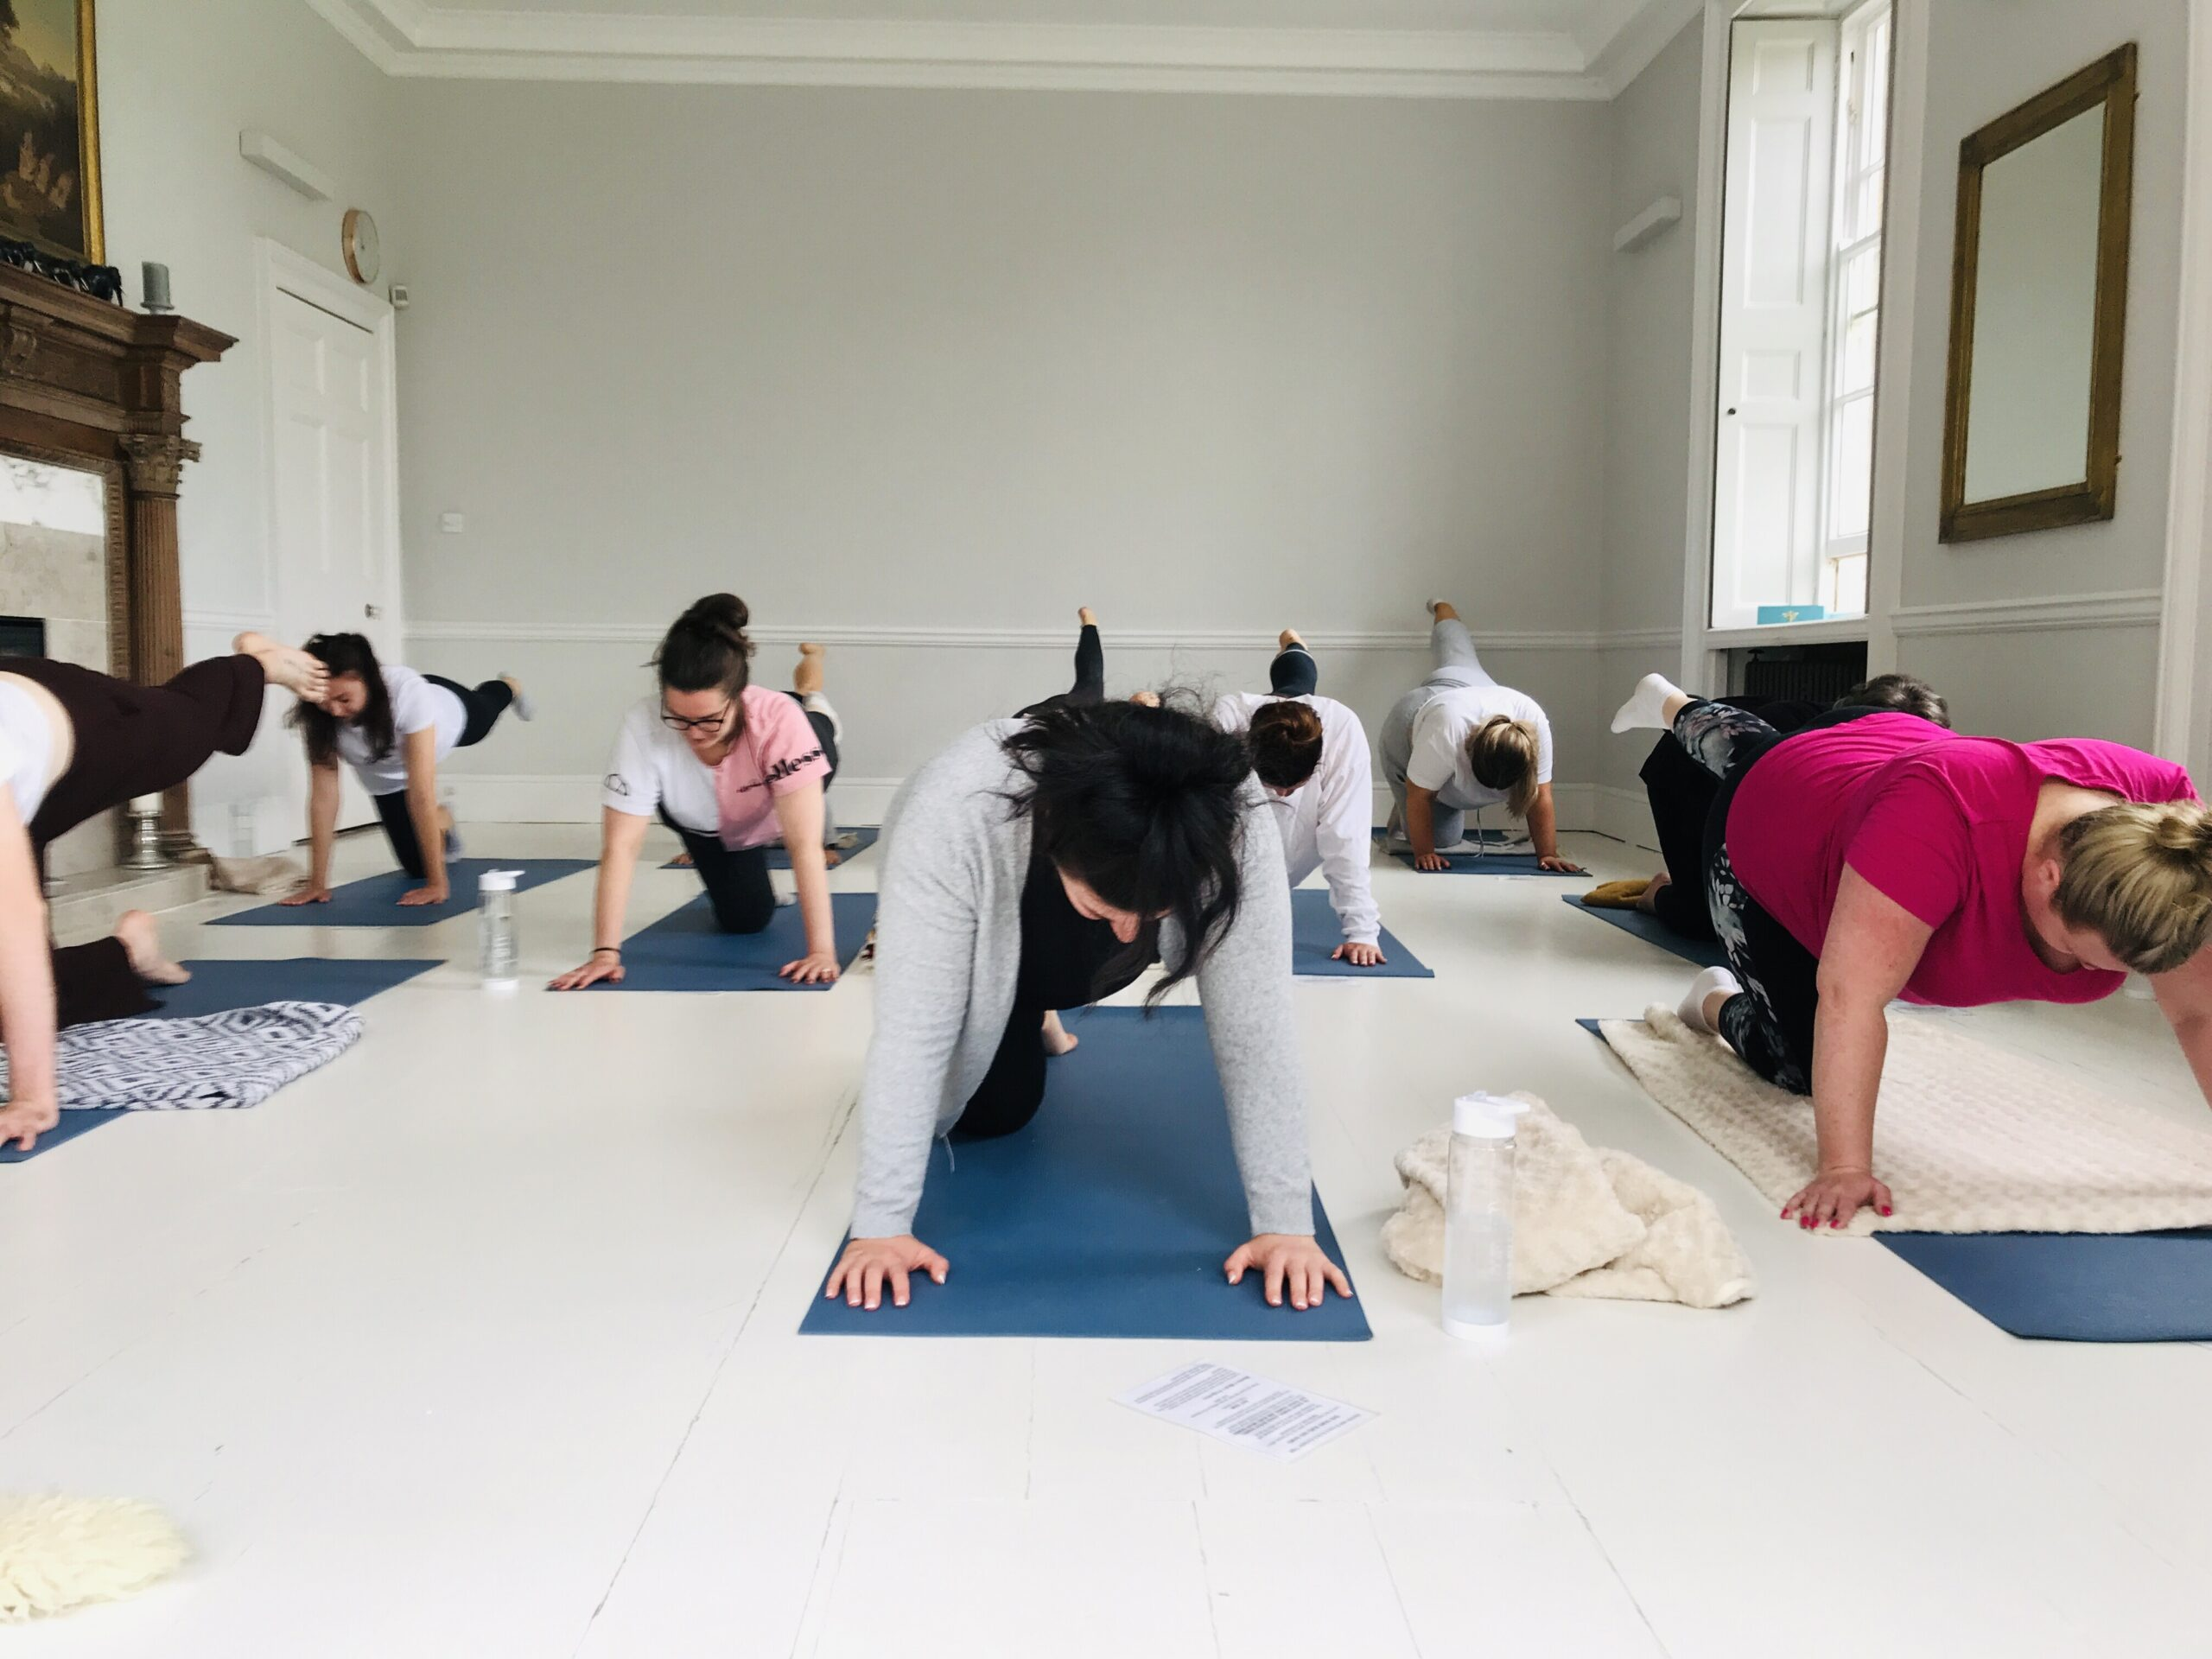 Beginners Kundalini yoga classes at YogaSpace Yorkshire